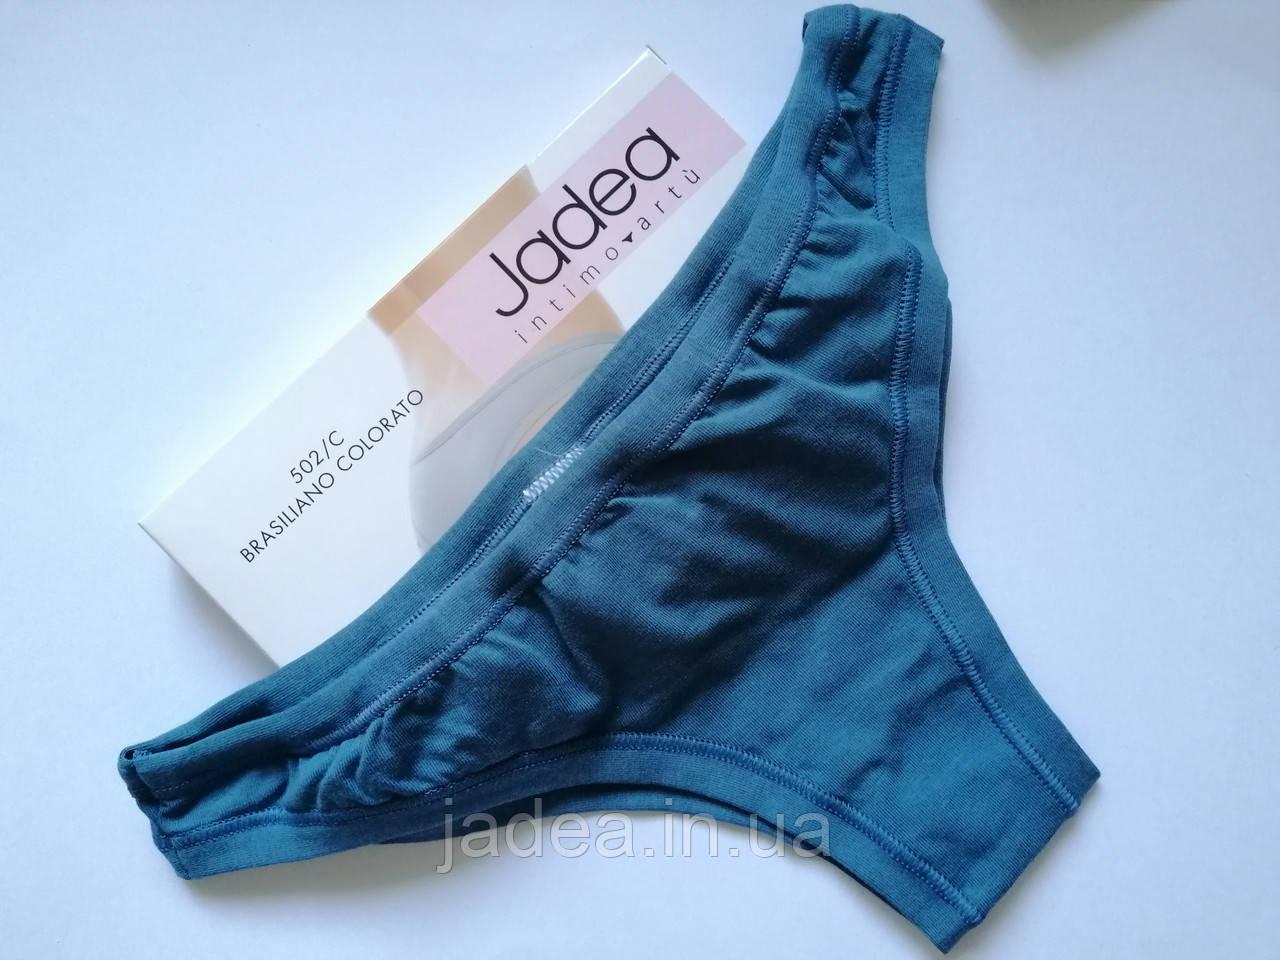 Jadea 502, Трусики бразиліана Jadea 502